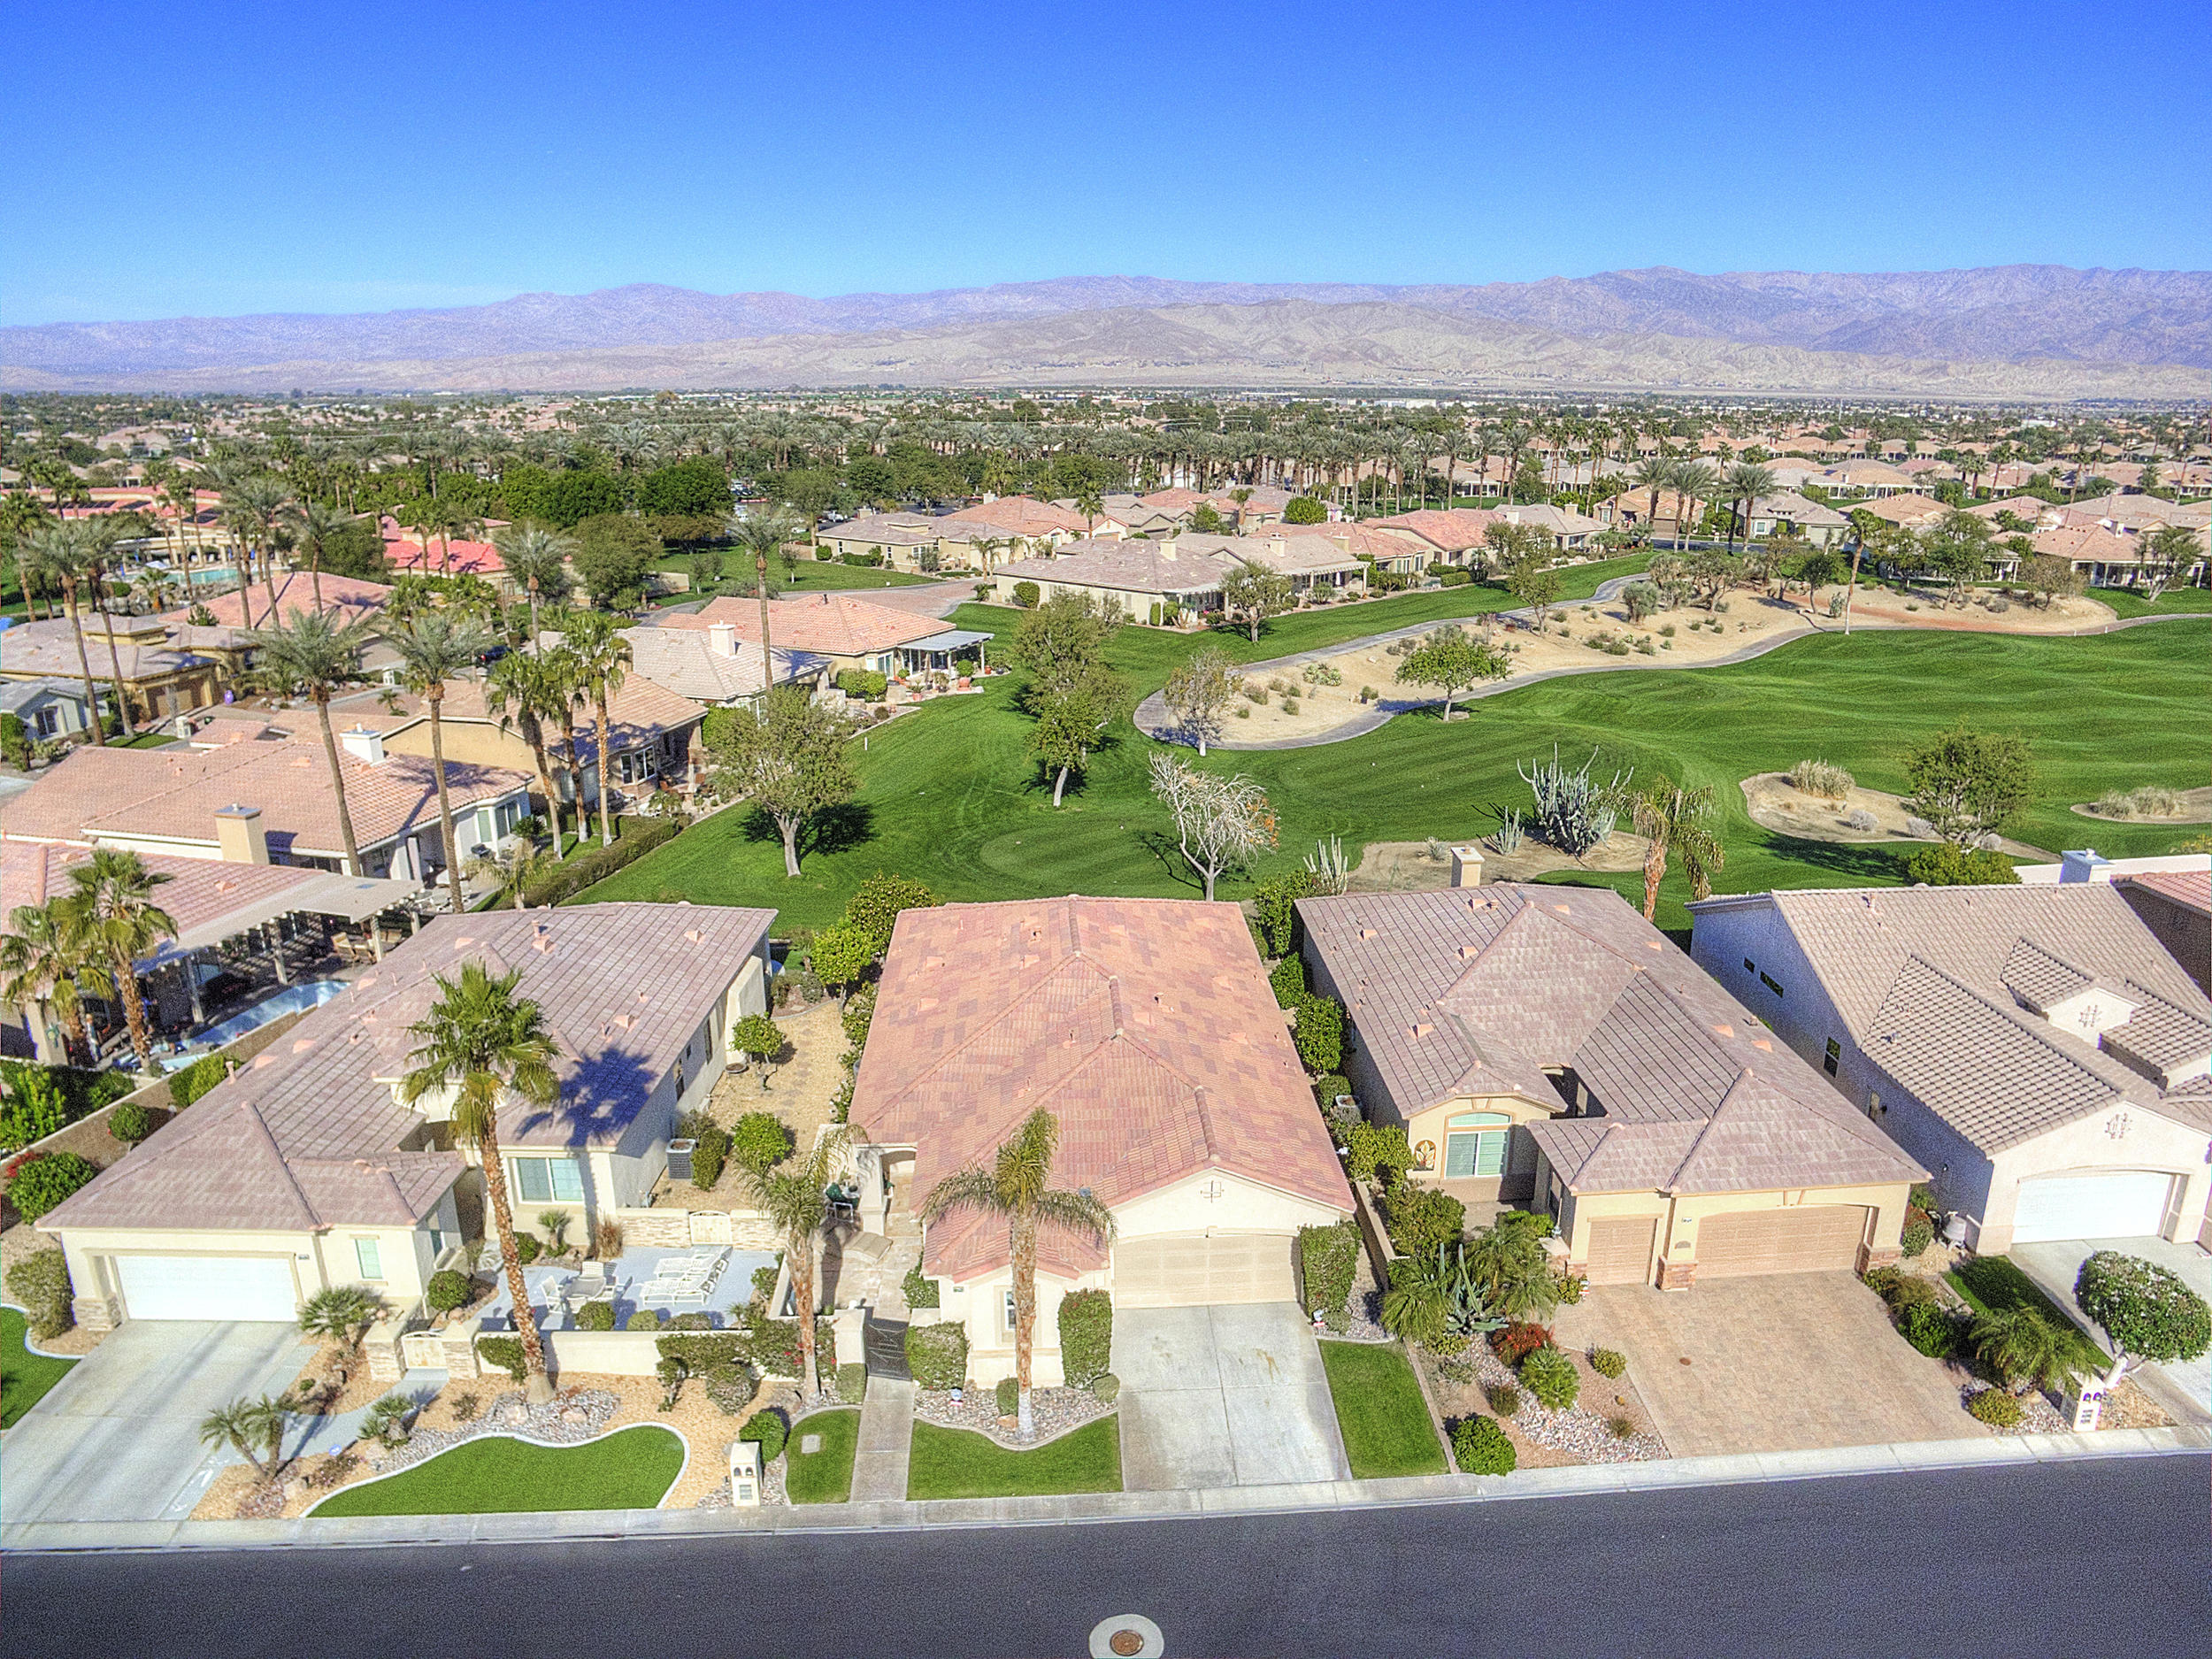 Photo of 80532 Knightswood Road, Indio, CA 92201